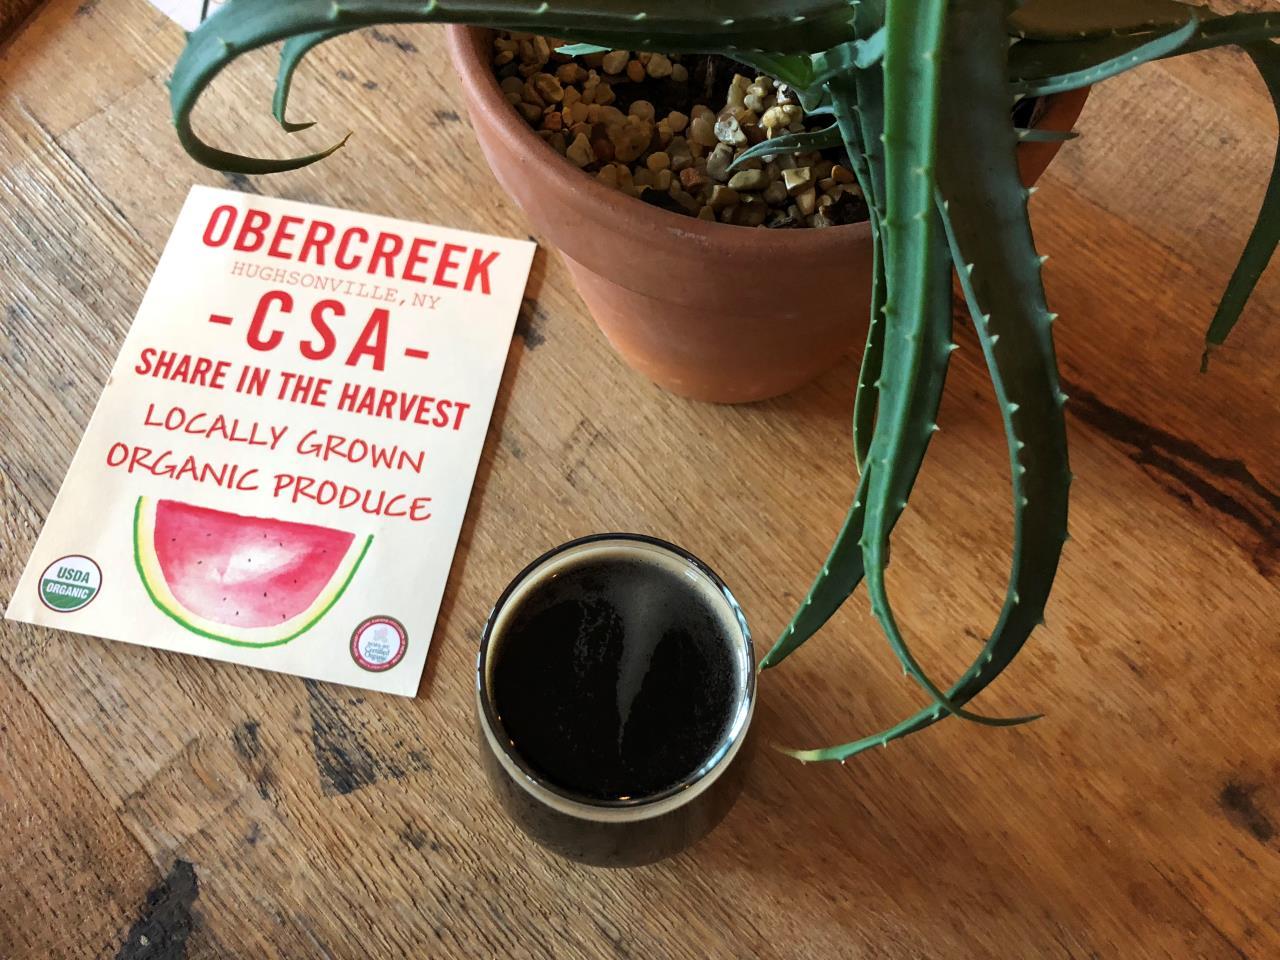 Obercreek - CSA